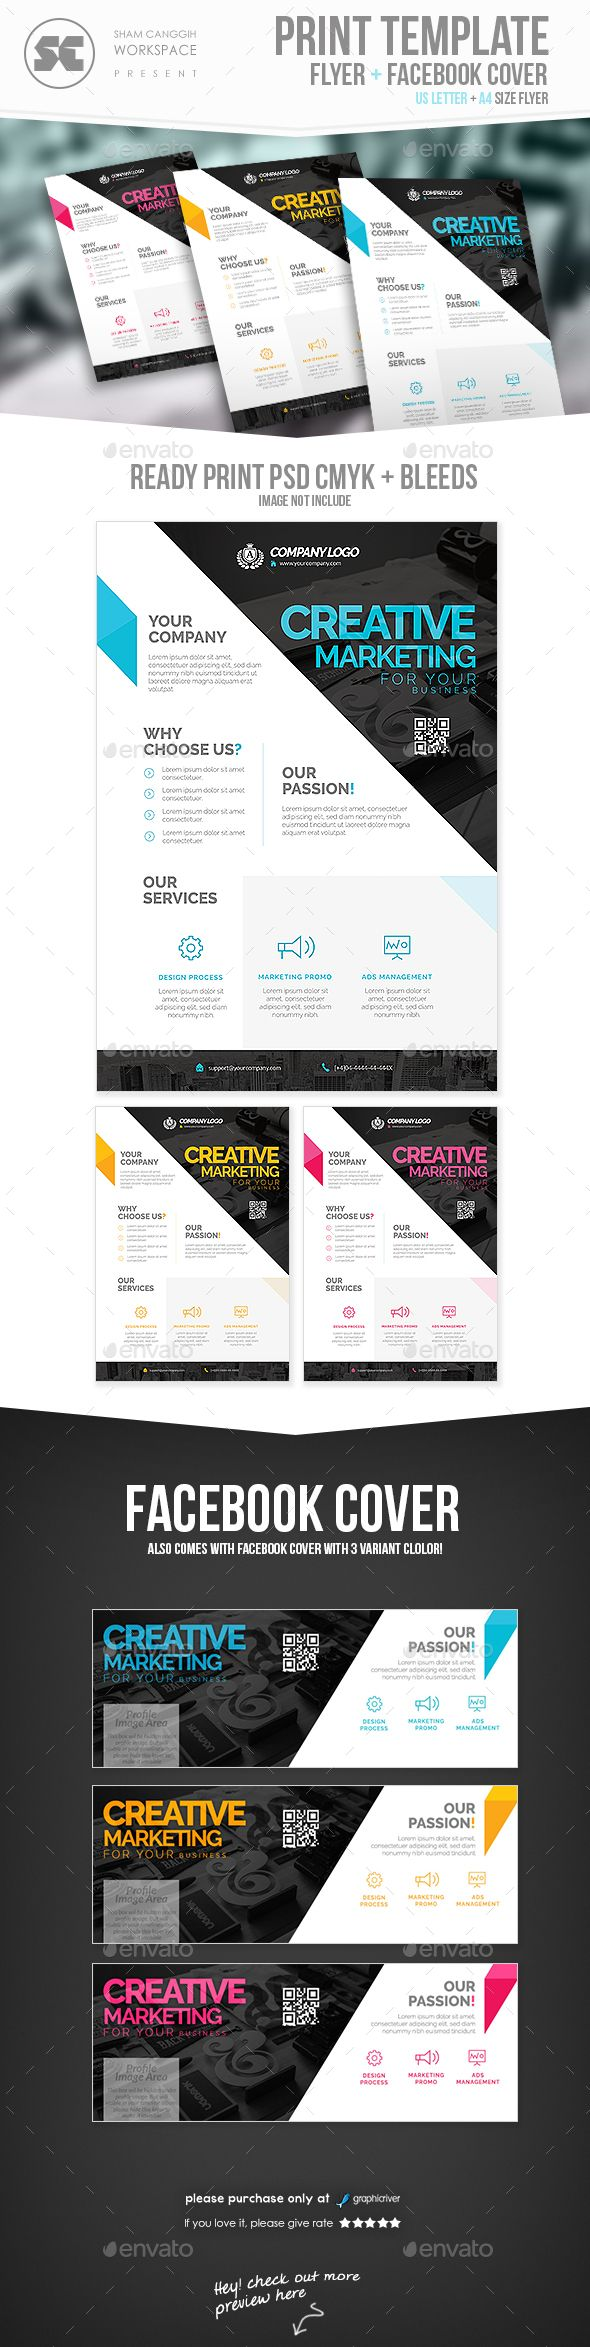 Corporate Flyer Template PSD #design Download: http://graphicriver.net/item/corporate-flyer/14277364?ref=ksioks